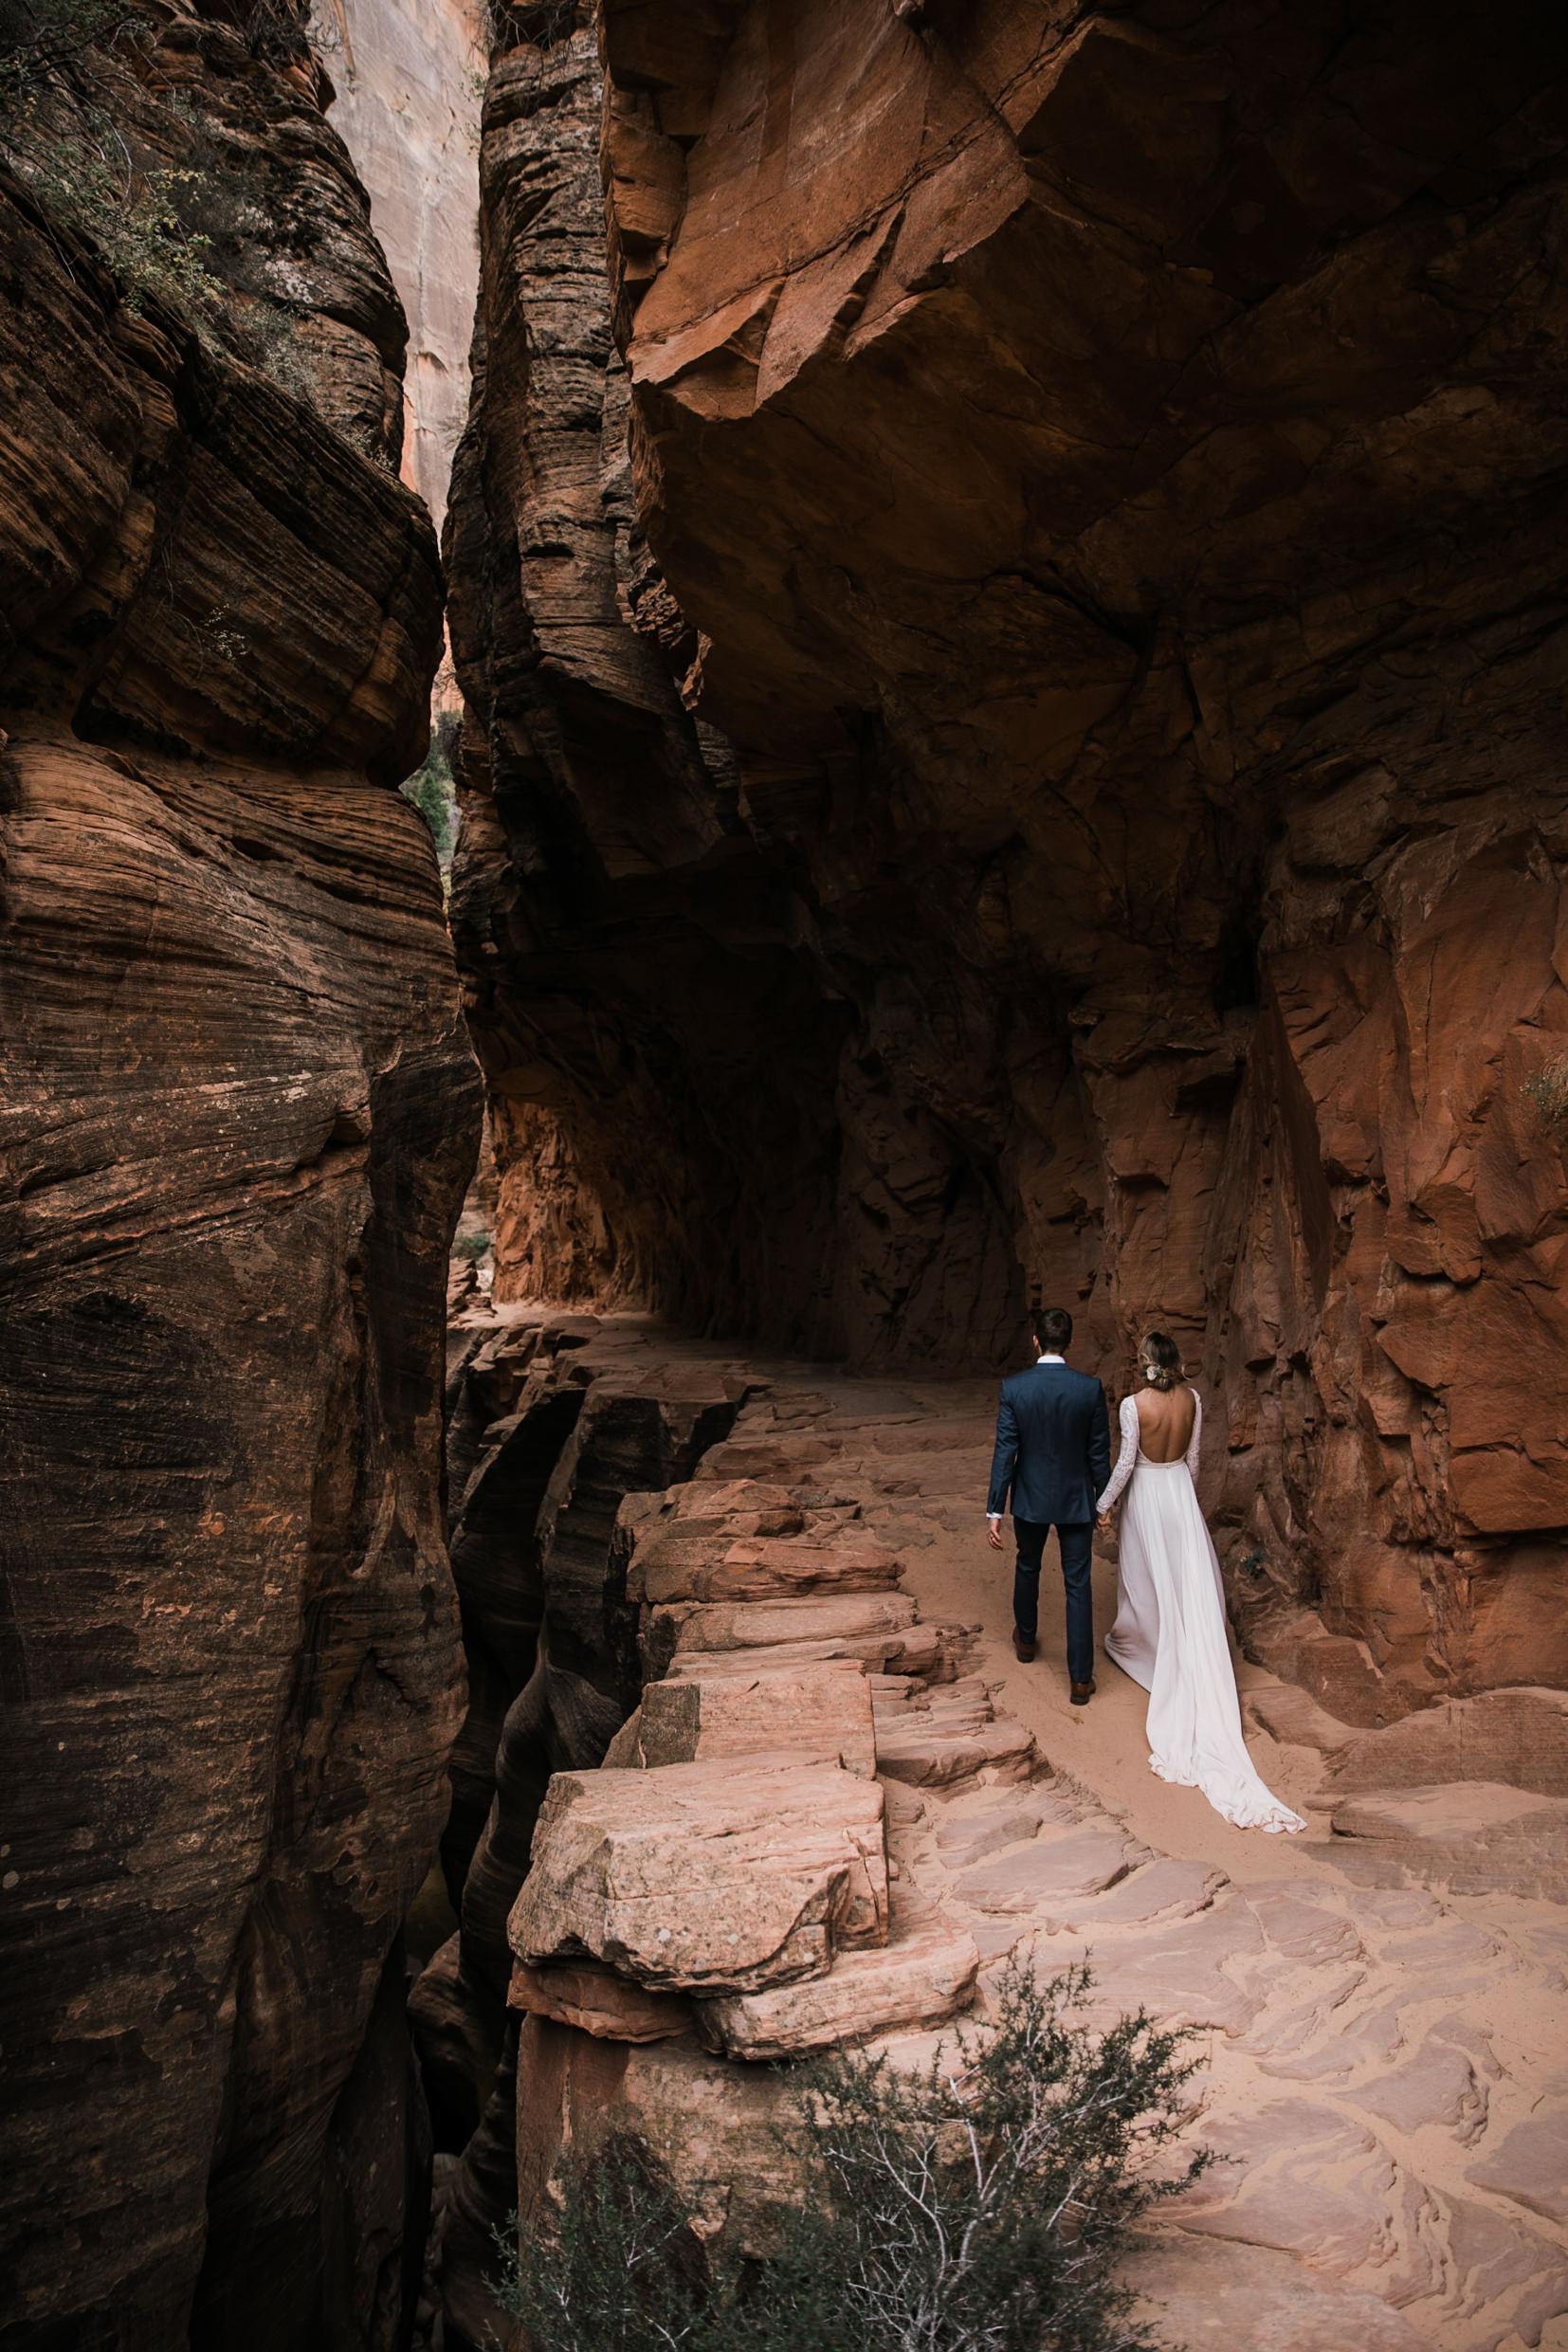 Zion-National-Park-Elopement-Wedding-Adventure-Hiking-Hearnes-Photography-50.jpg